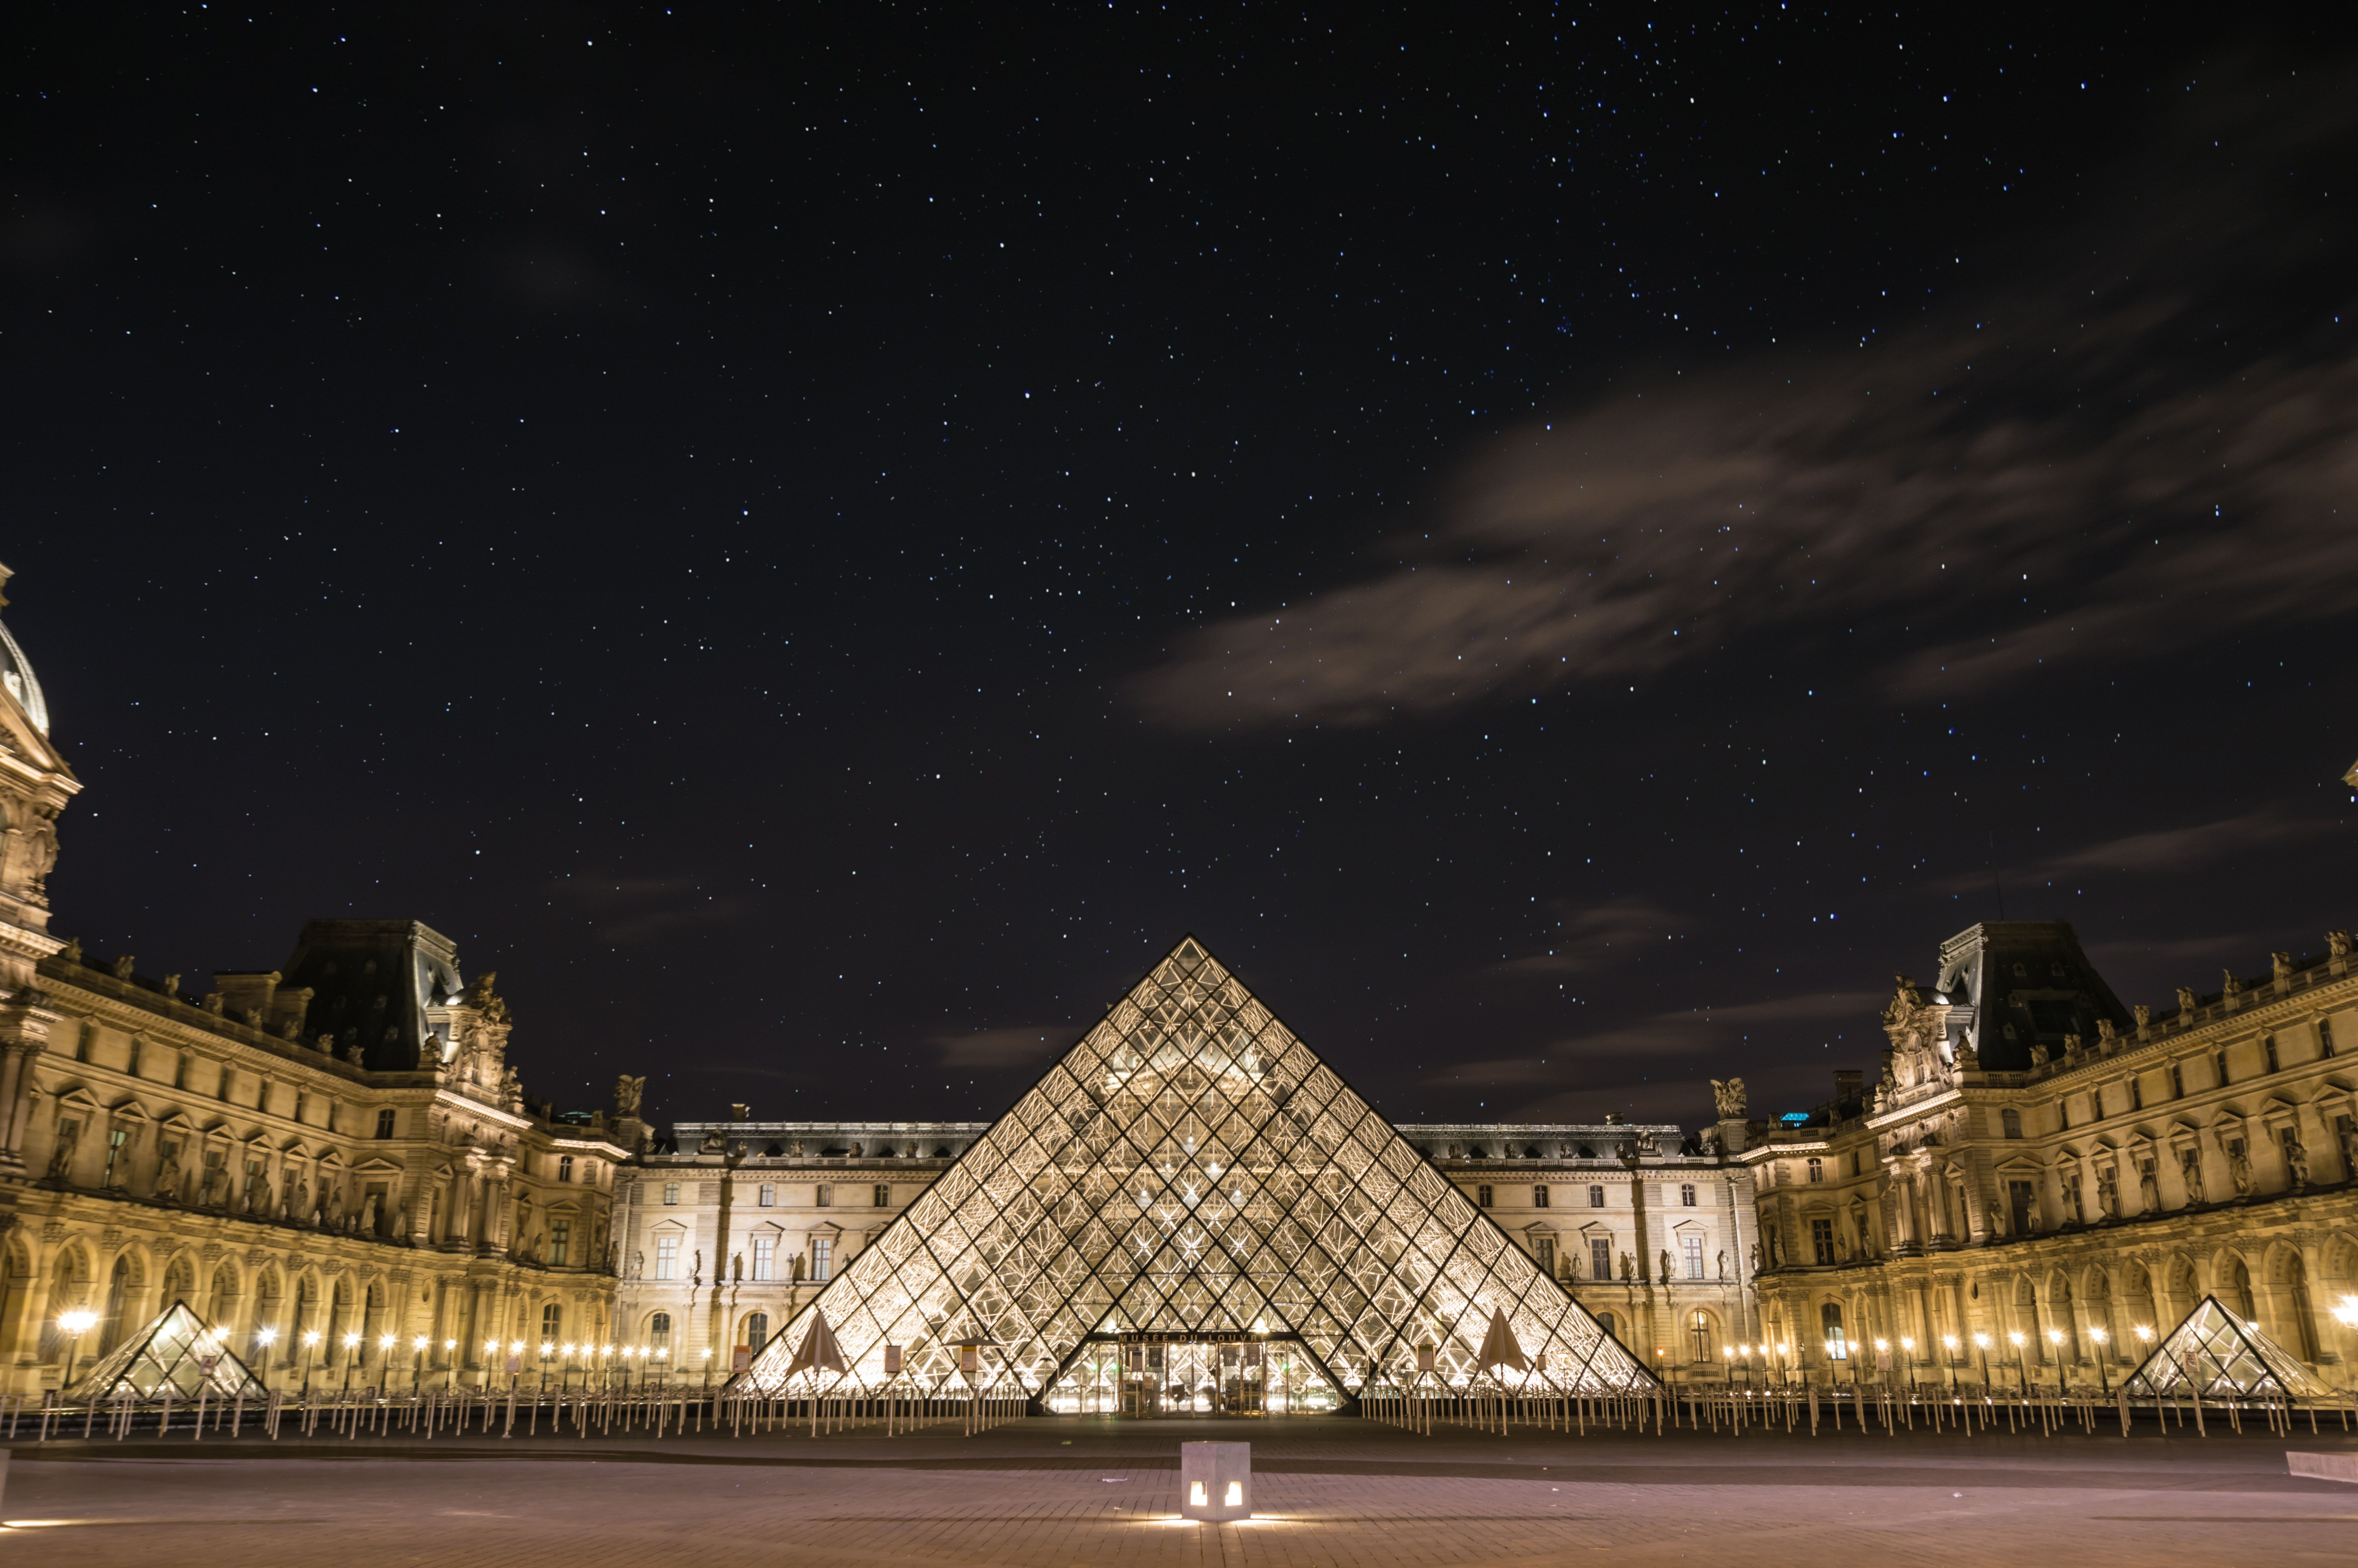 Paris E France Art Print Home Decor Wall Art Poster Louvre Museum At Night